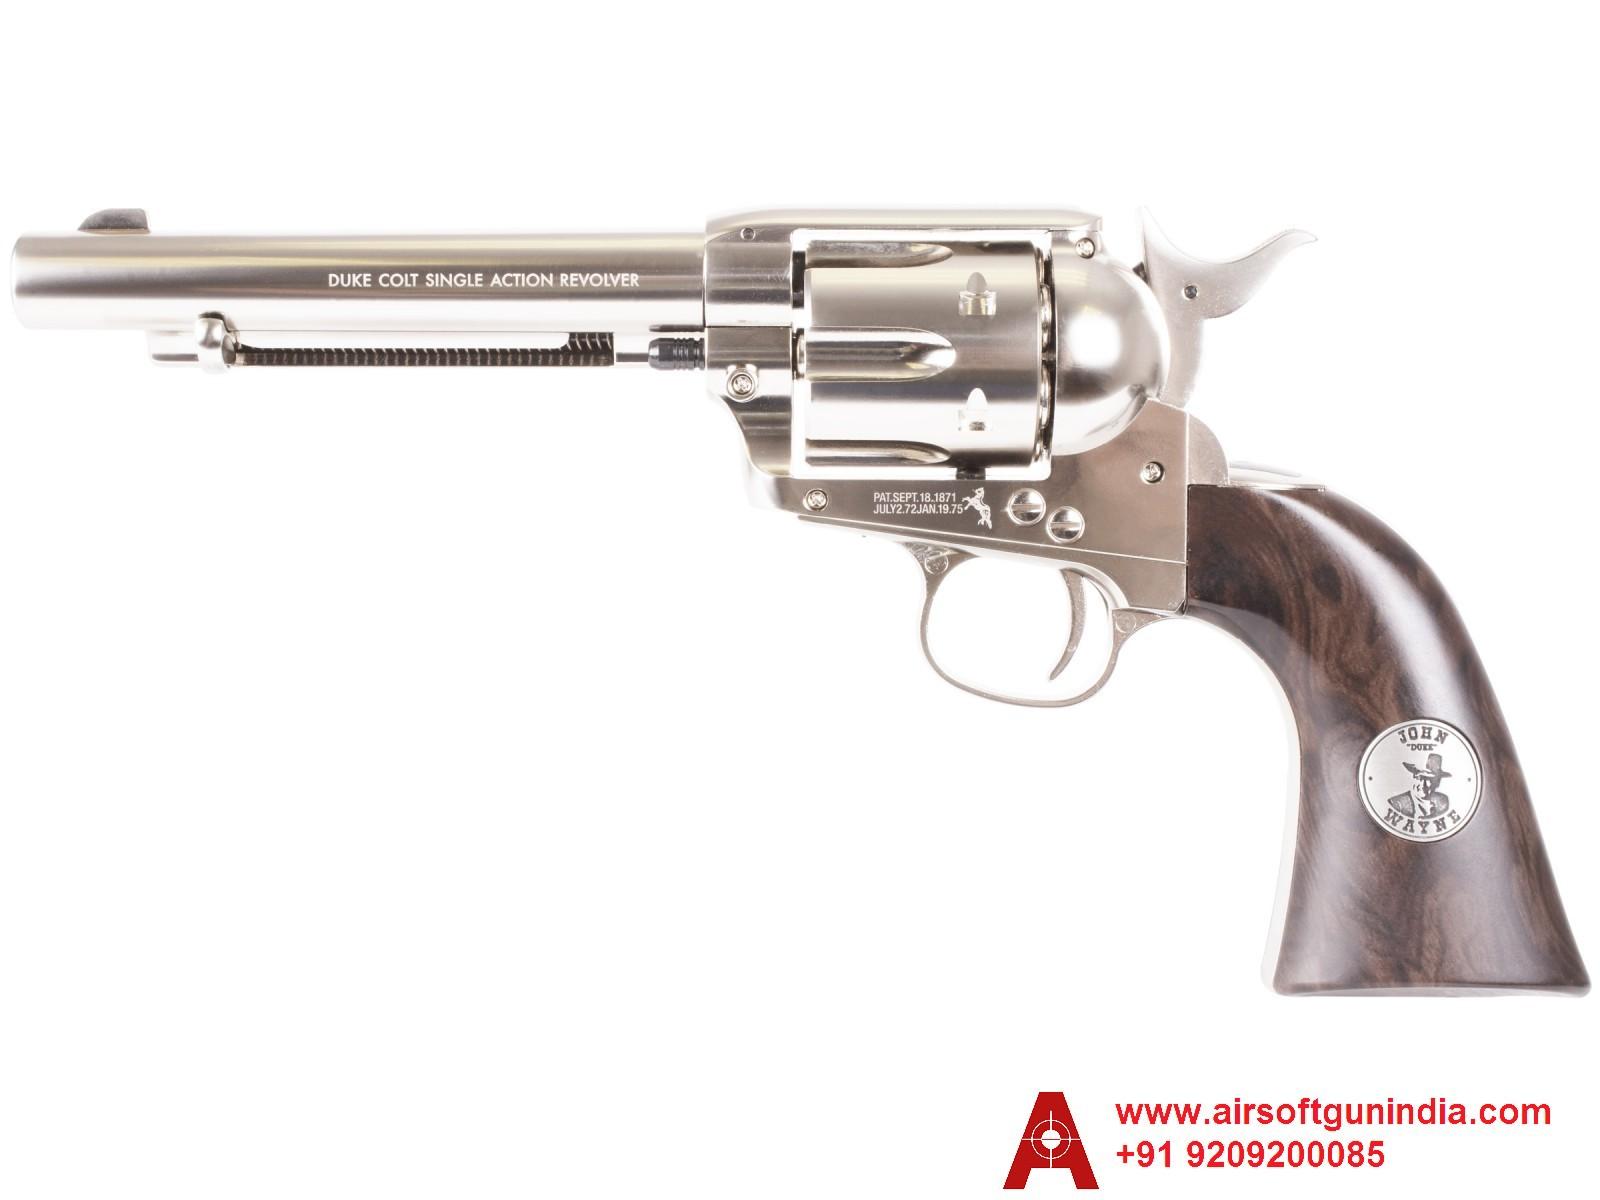 John Wayne Colt CO2 Pellet Revolver, Nickel By Airsoft Gun India